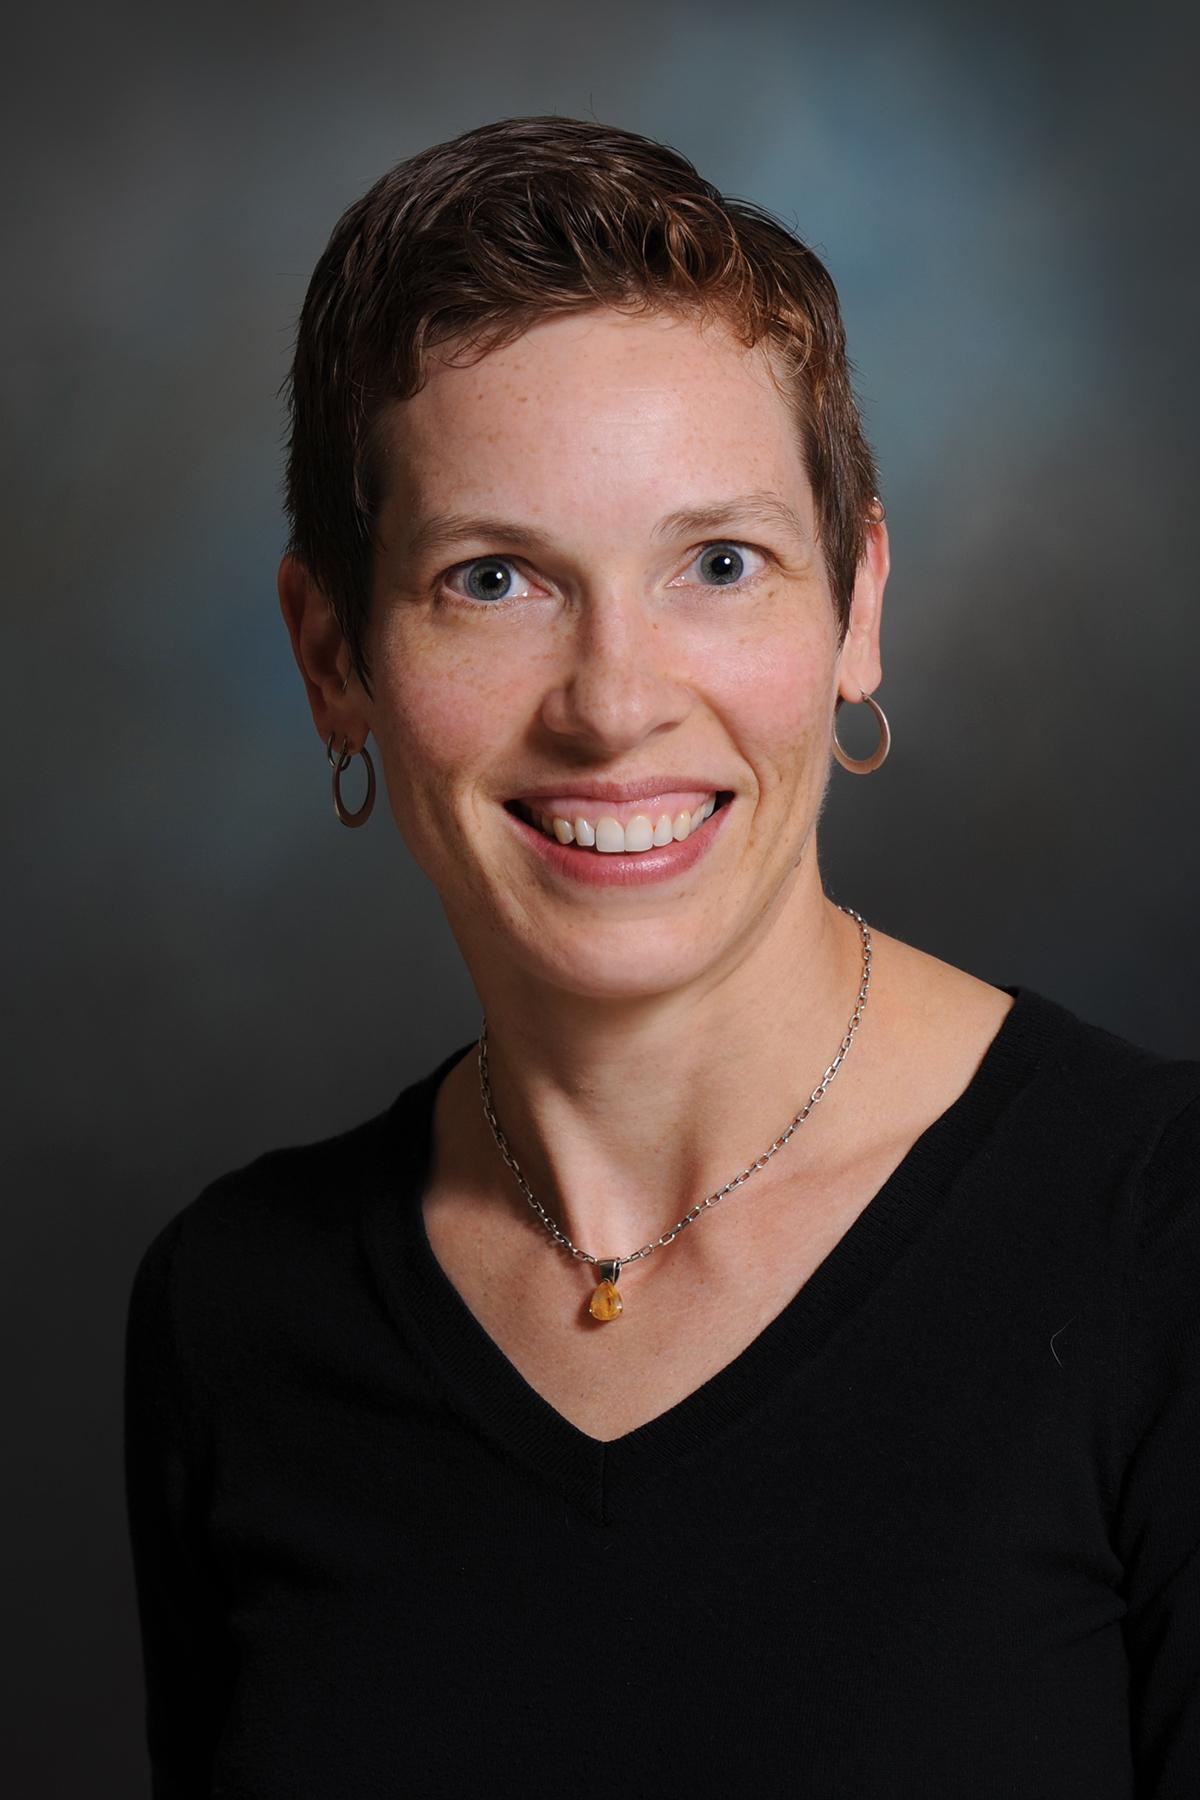 Lead author Dr. Erin Krebs